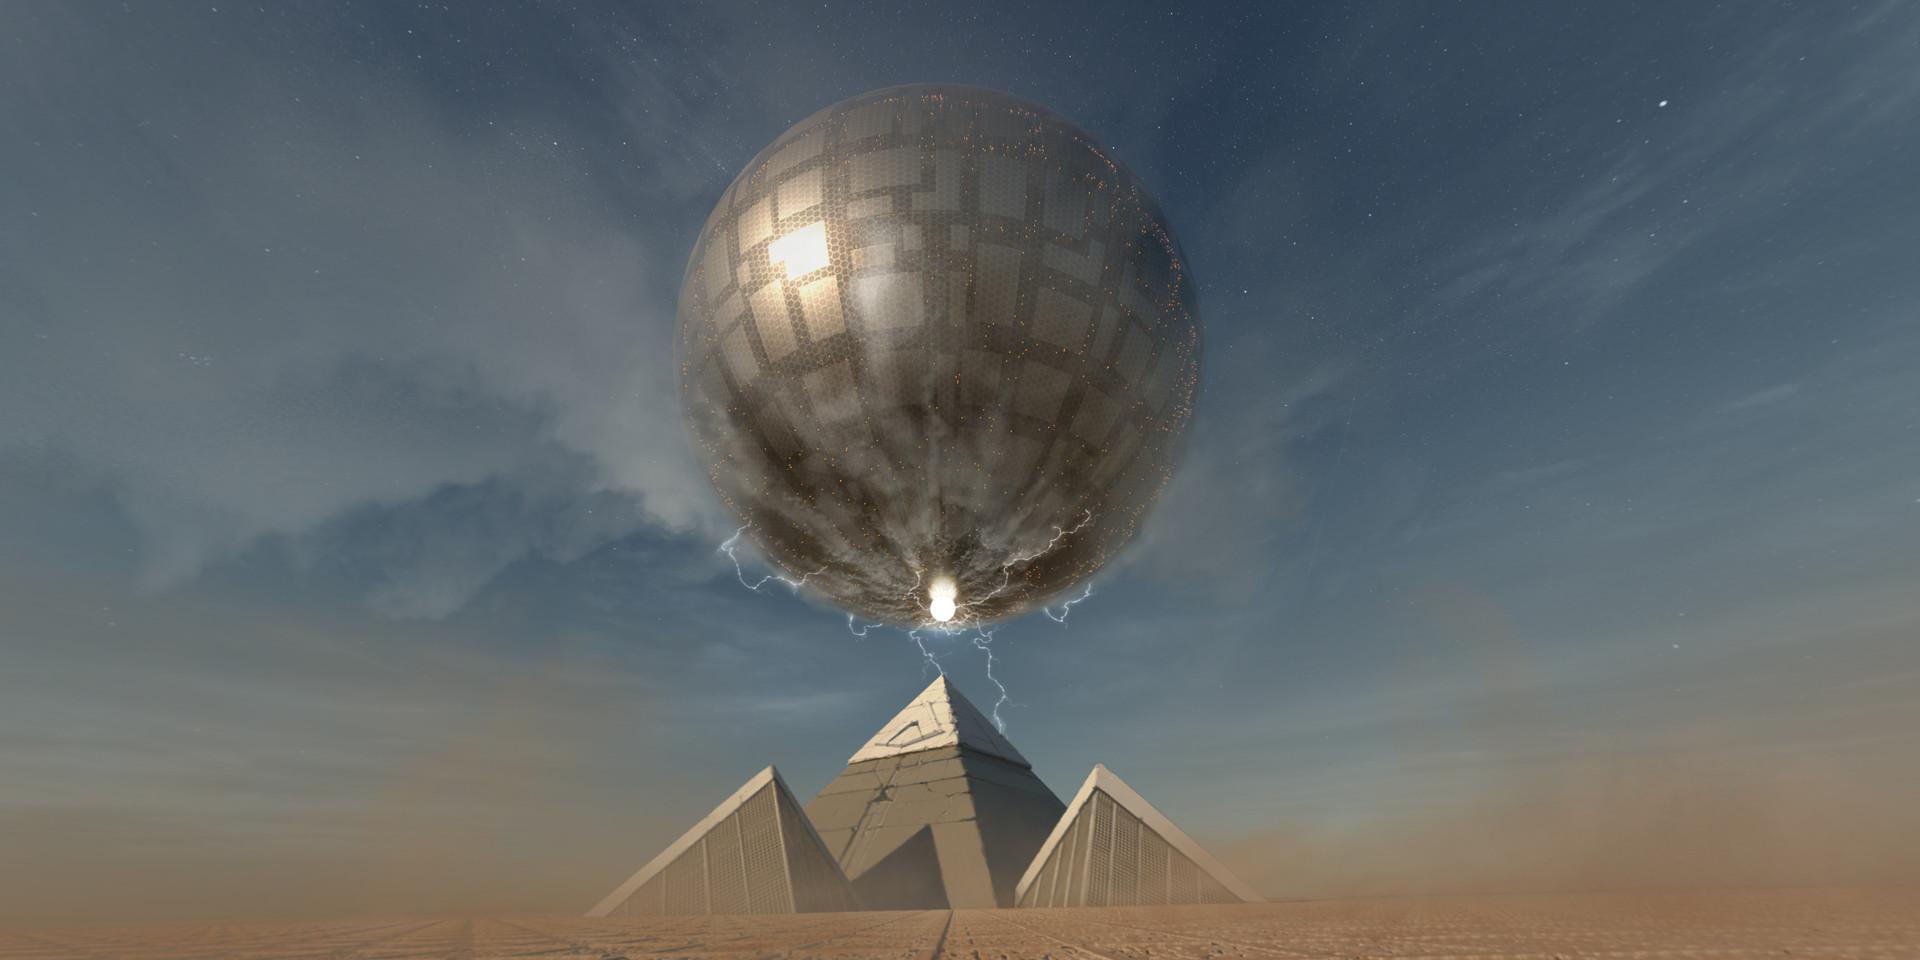 Jeff bartzis as01 env planetsurface spherical 002 c